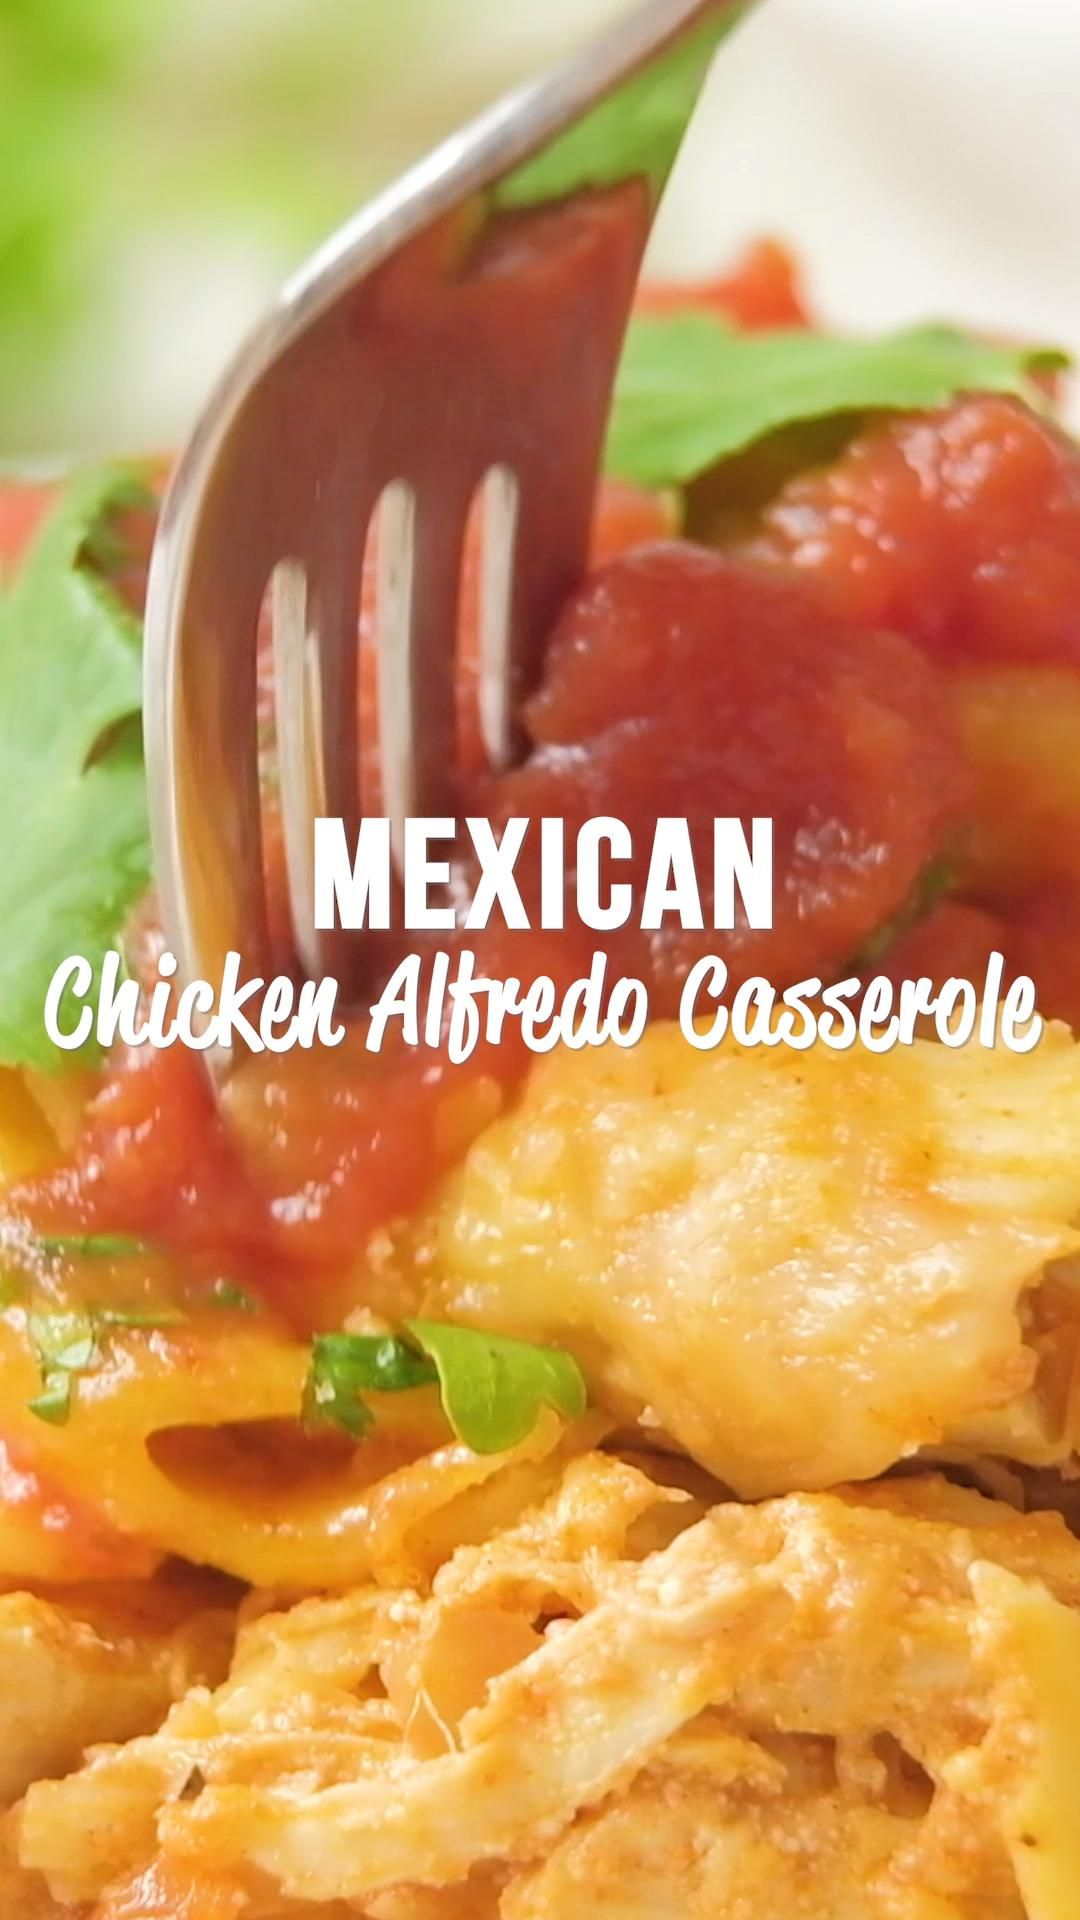 Mexican Chicken Alfredo Casserole